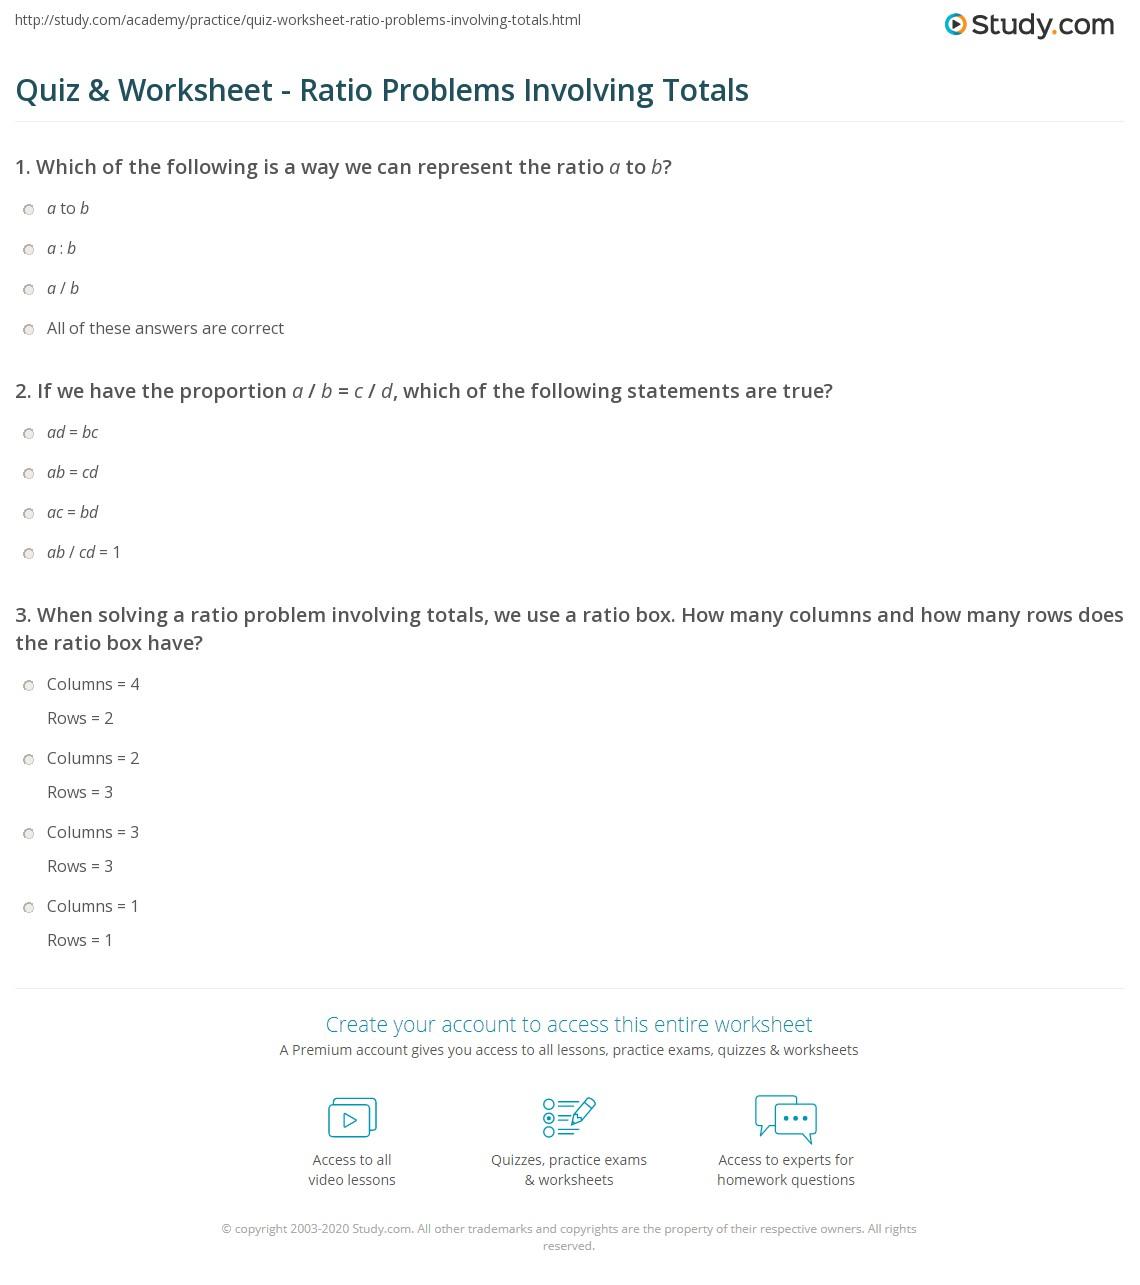 Quiz W Ksheet R Tio Problems Volv G Tot Ls Study